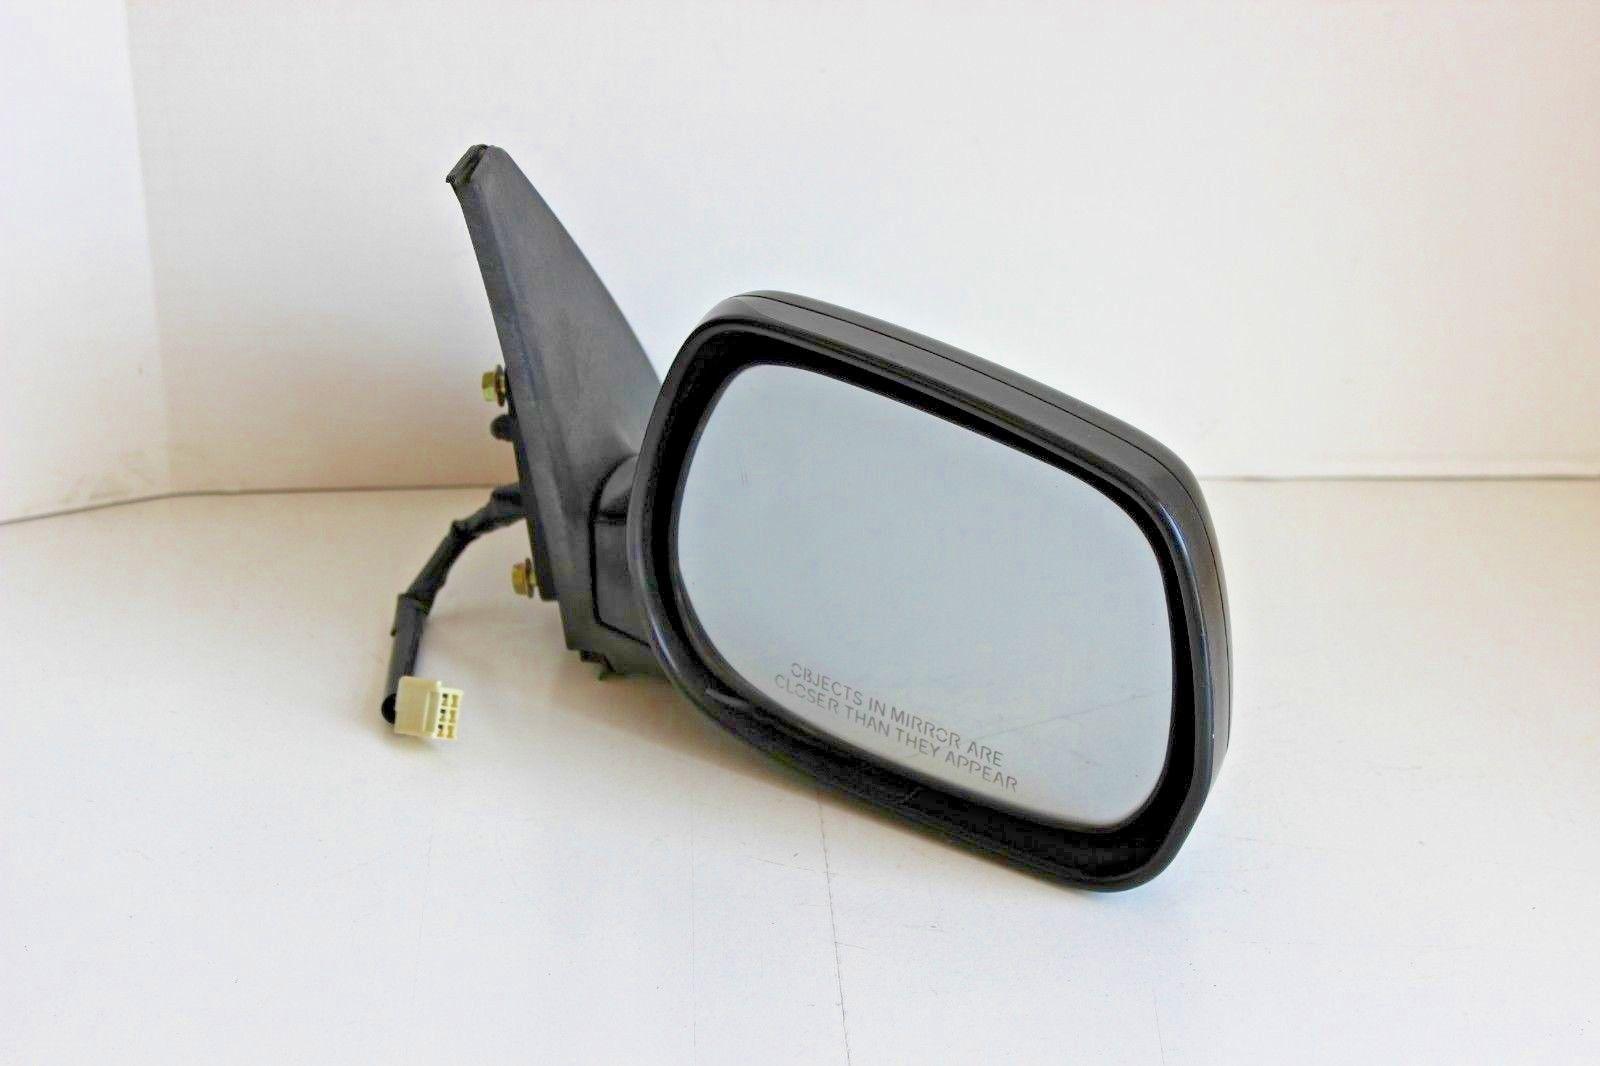 2010 Subaru Legacy /& Outback Right Outside Mirror Heated OEM CAP Passenger RH